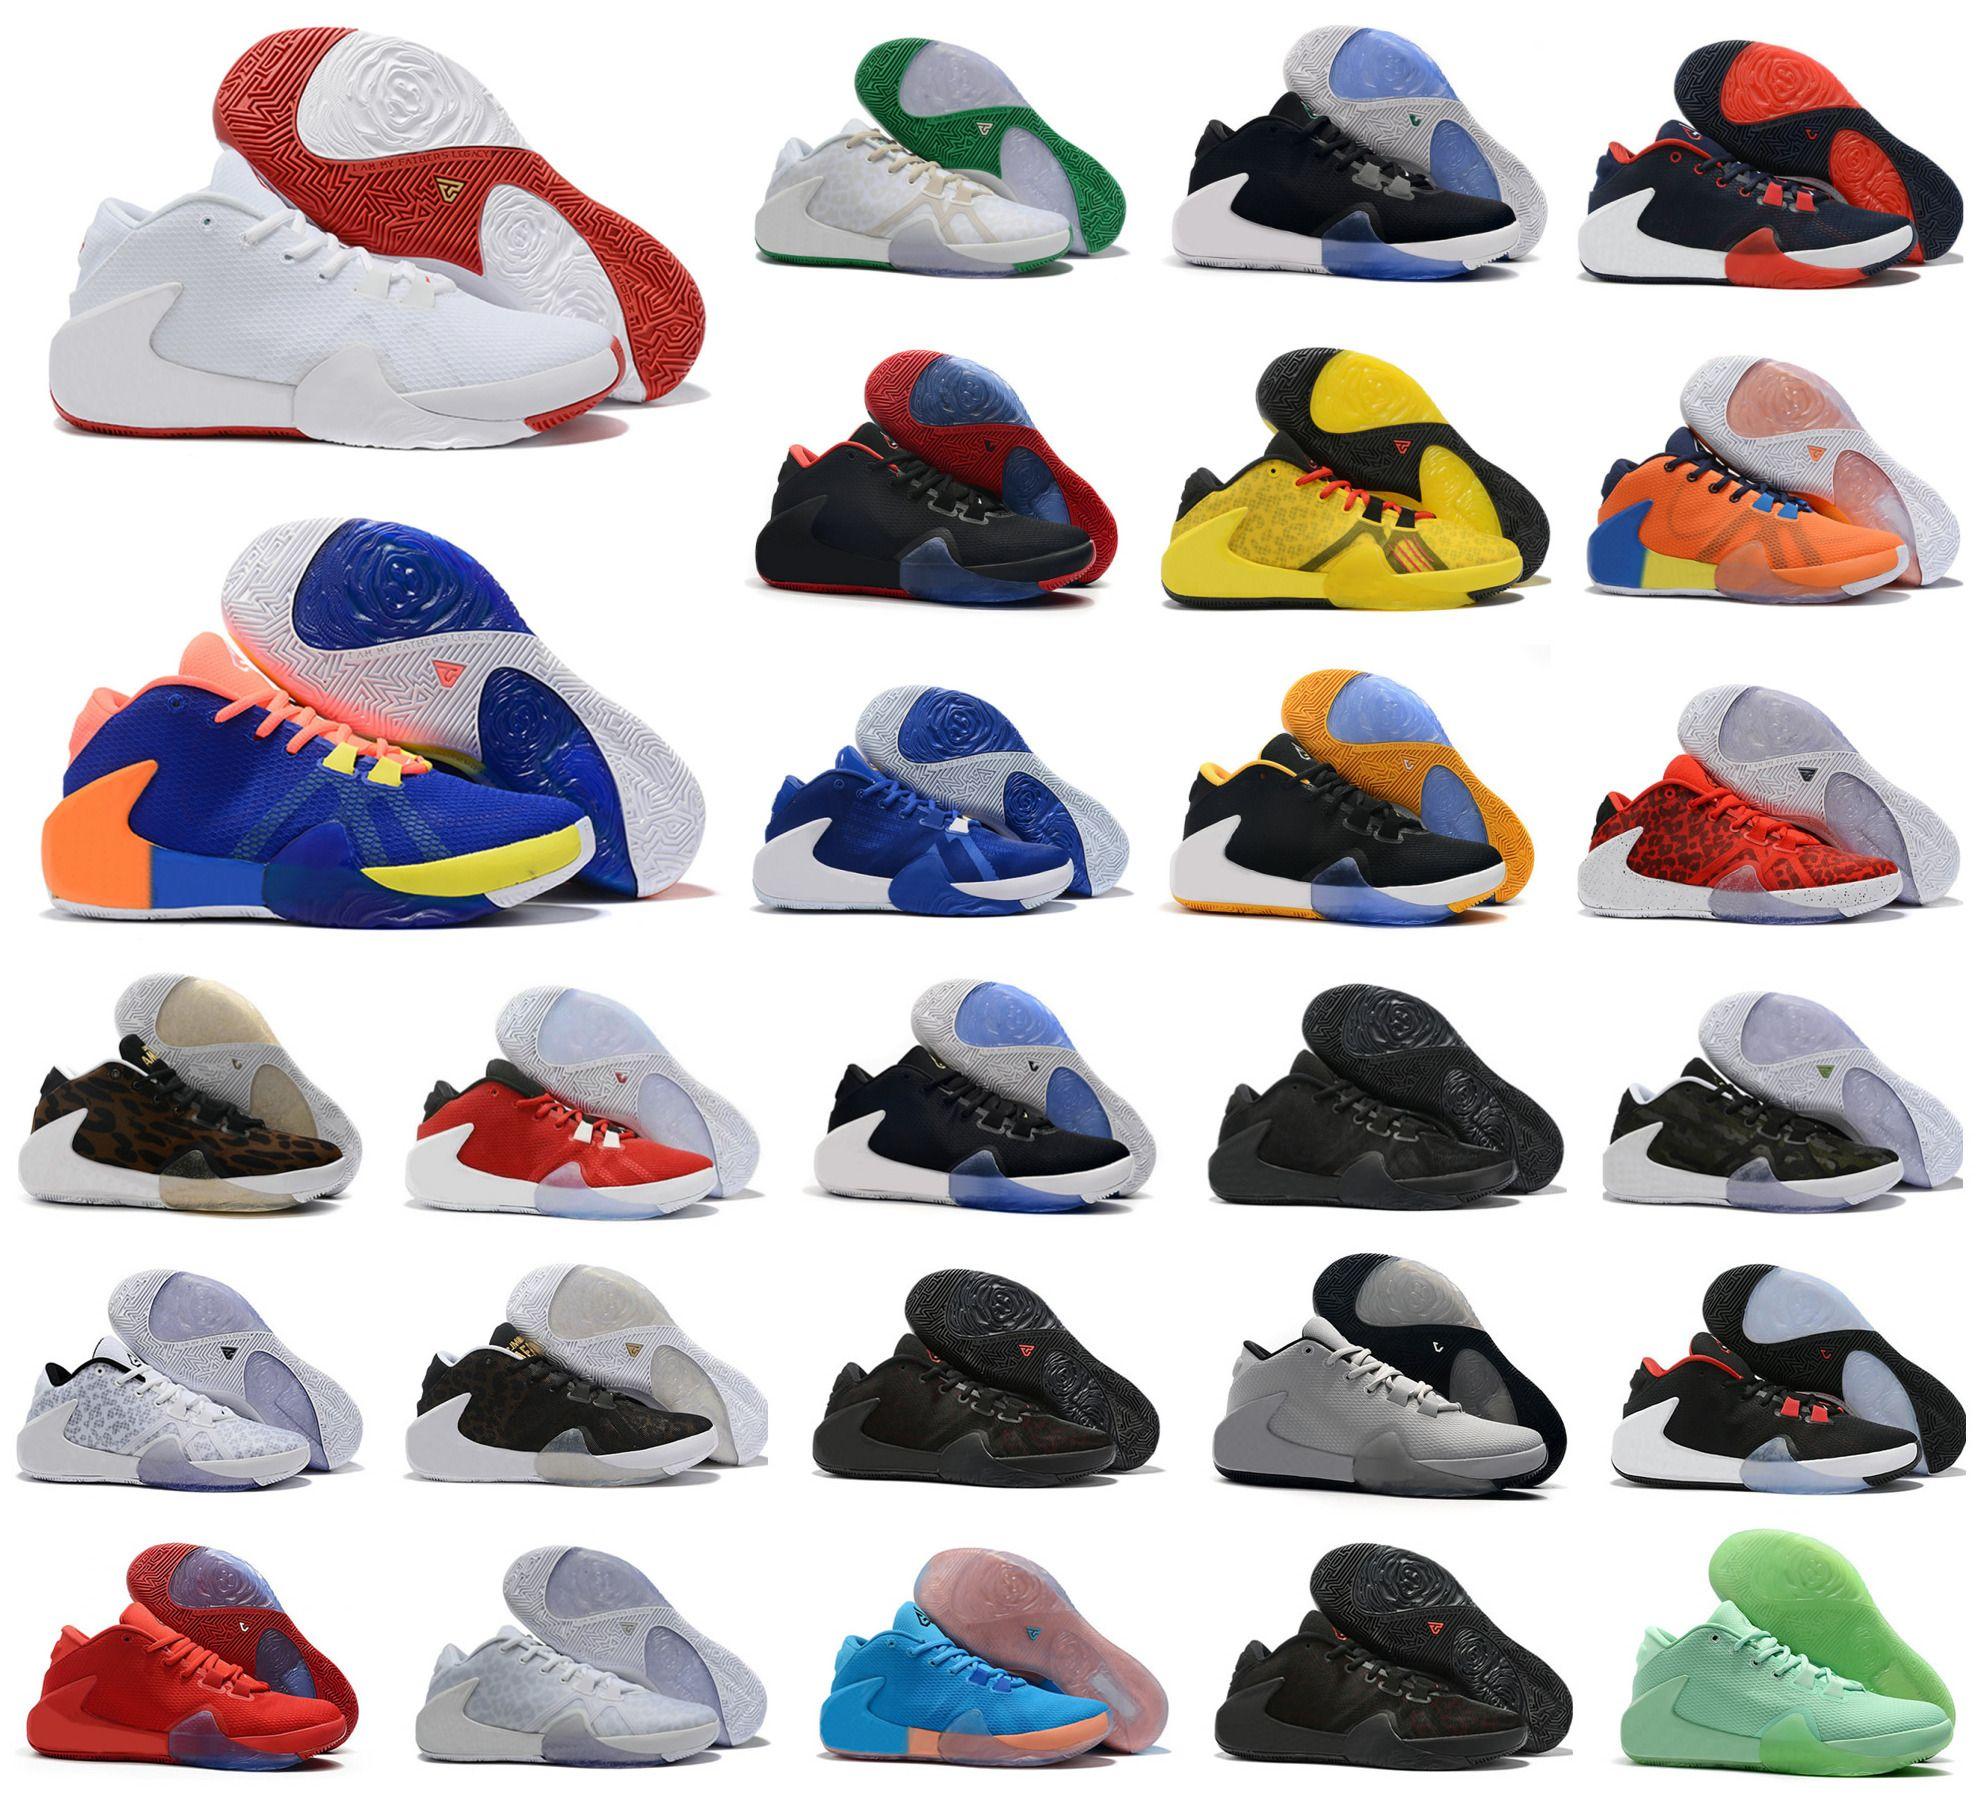 Hot New Style ZOOM Greek Freak 1 Giannis Antetokounmpo GA I 1S Signature Basketball Shoes Cheap GA1 Sports Sneakers Size 40-46